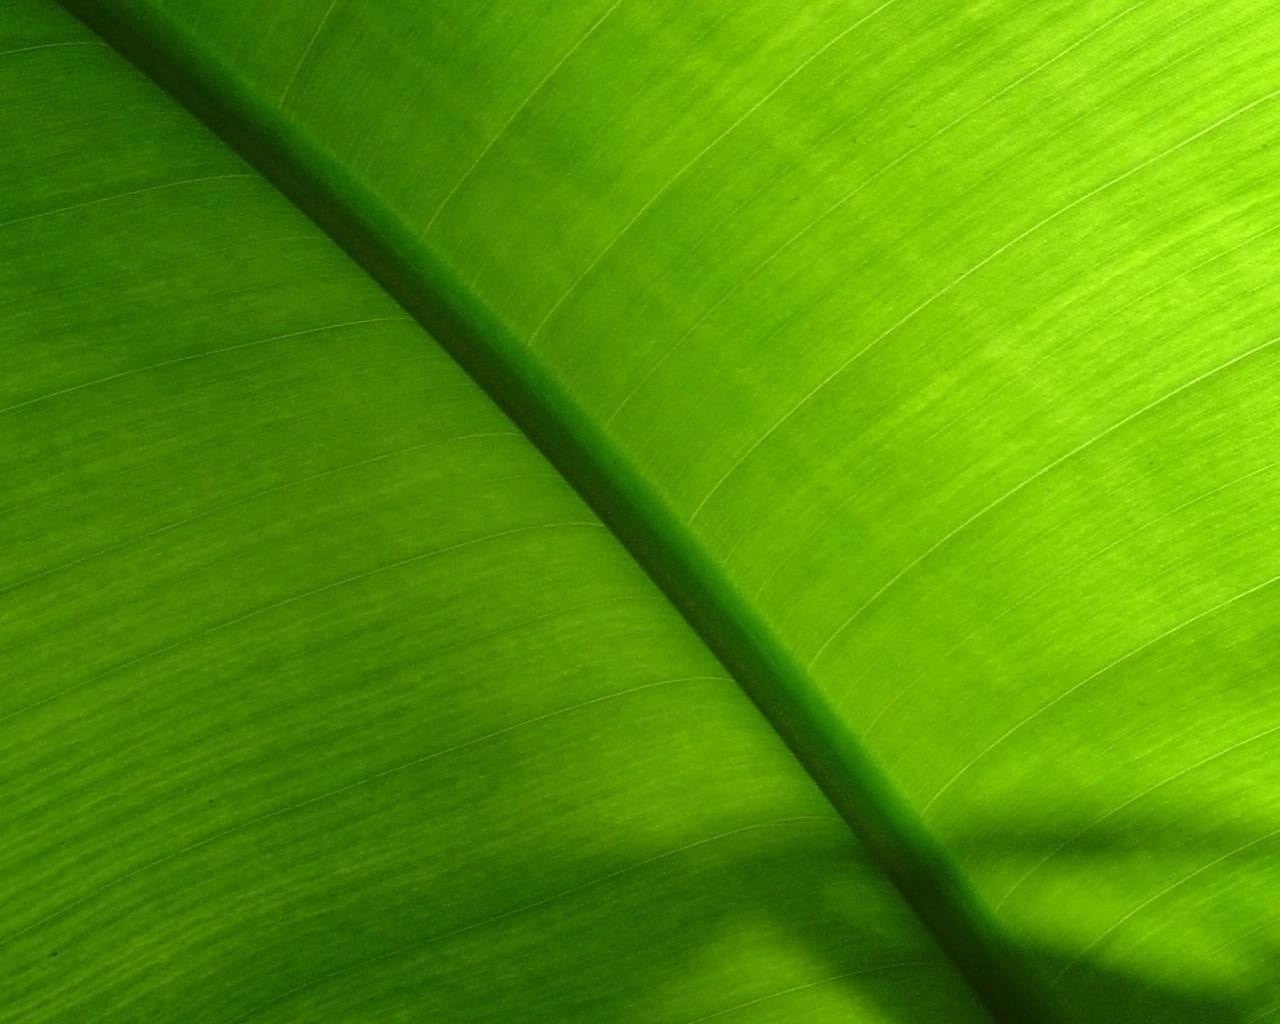 Fond d'ecran Zoom vert chlorophylle - Wallpaper